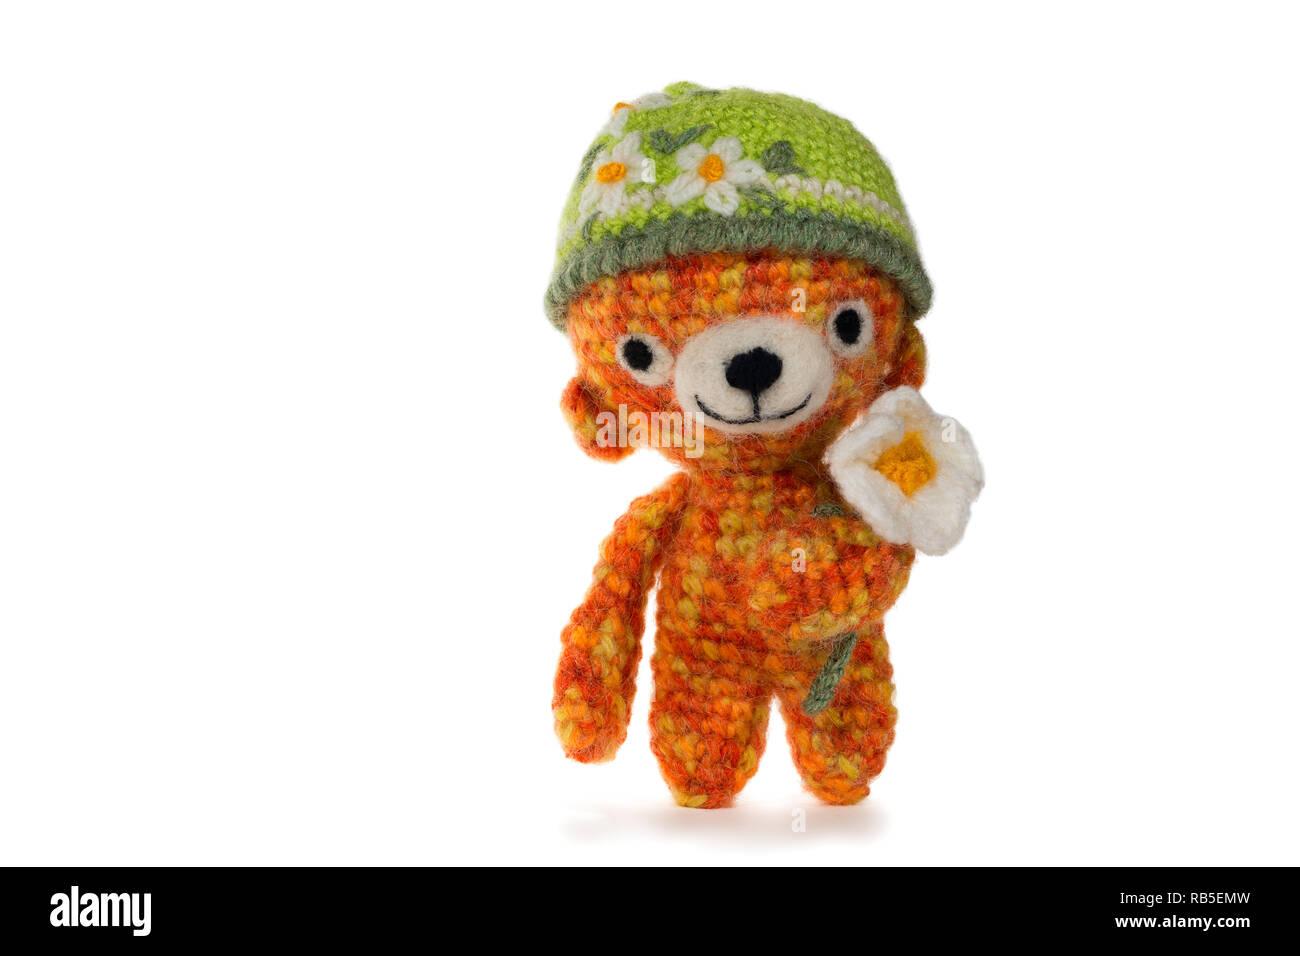 Crochet bear amigurumi pattern   Amiguroom Toys   956x1300